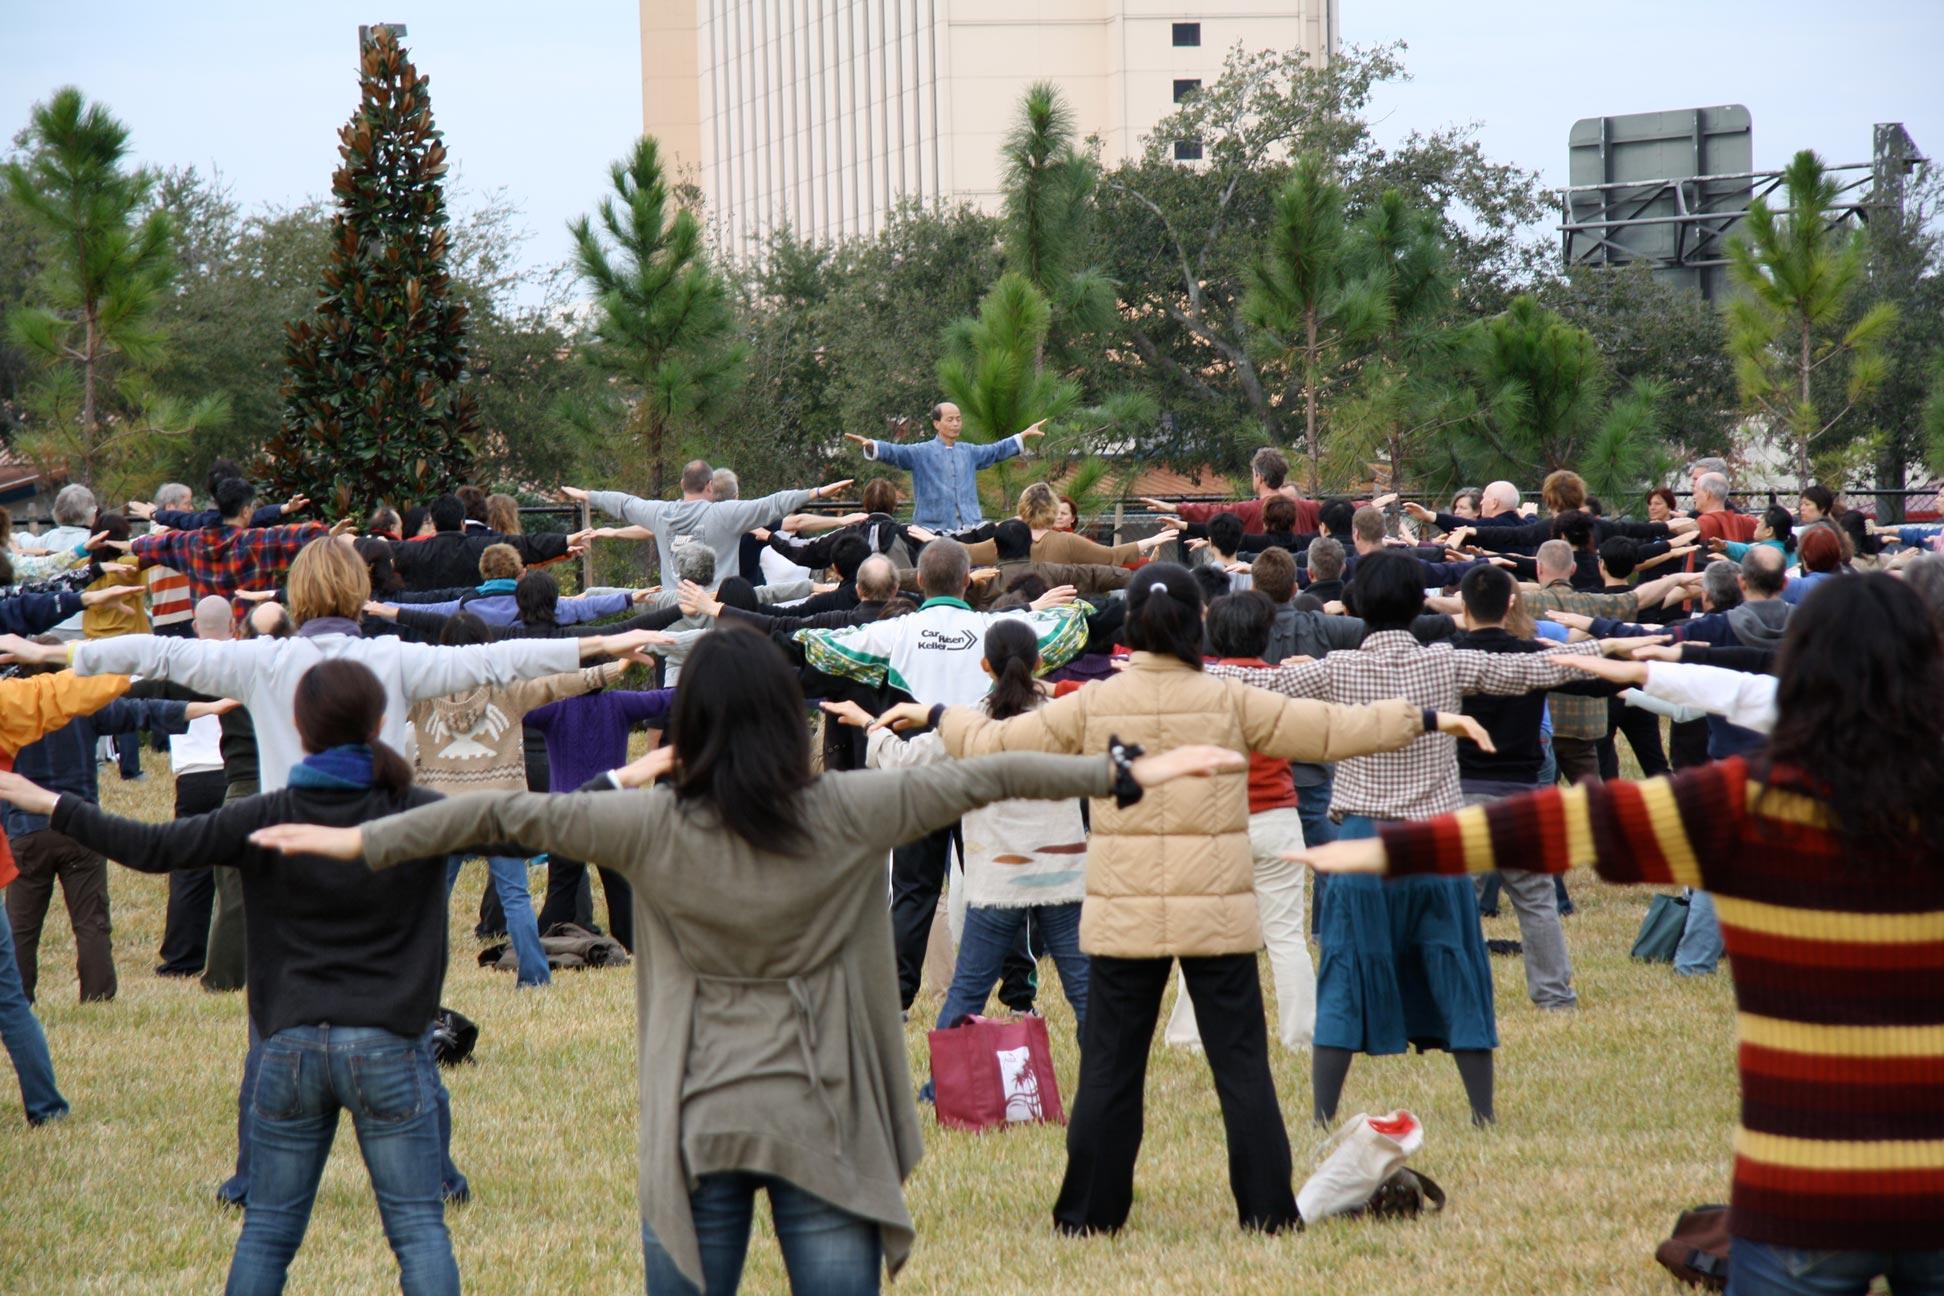 cours de Qi Gong en plein air